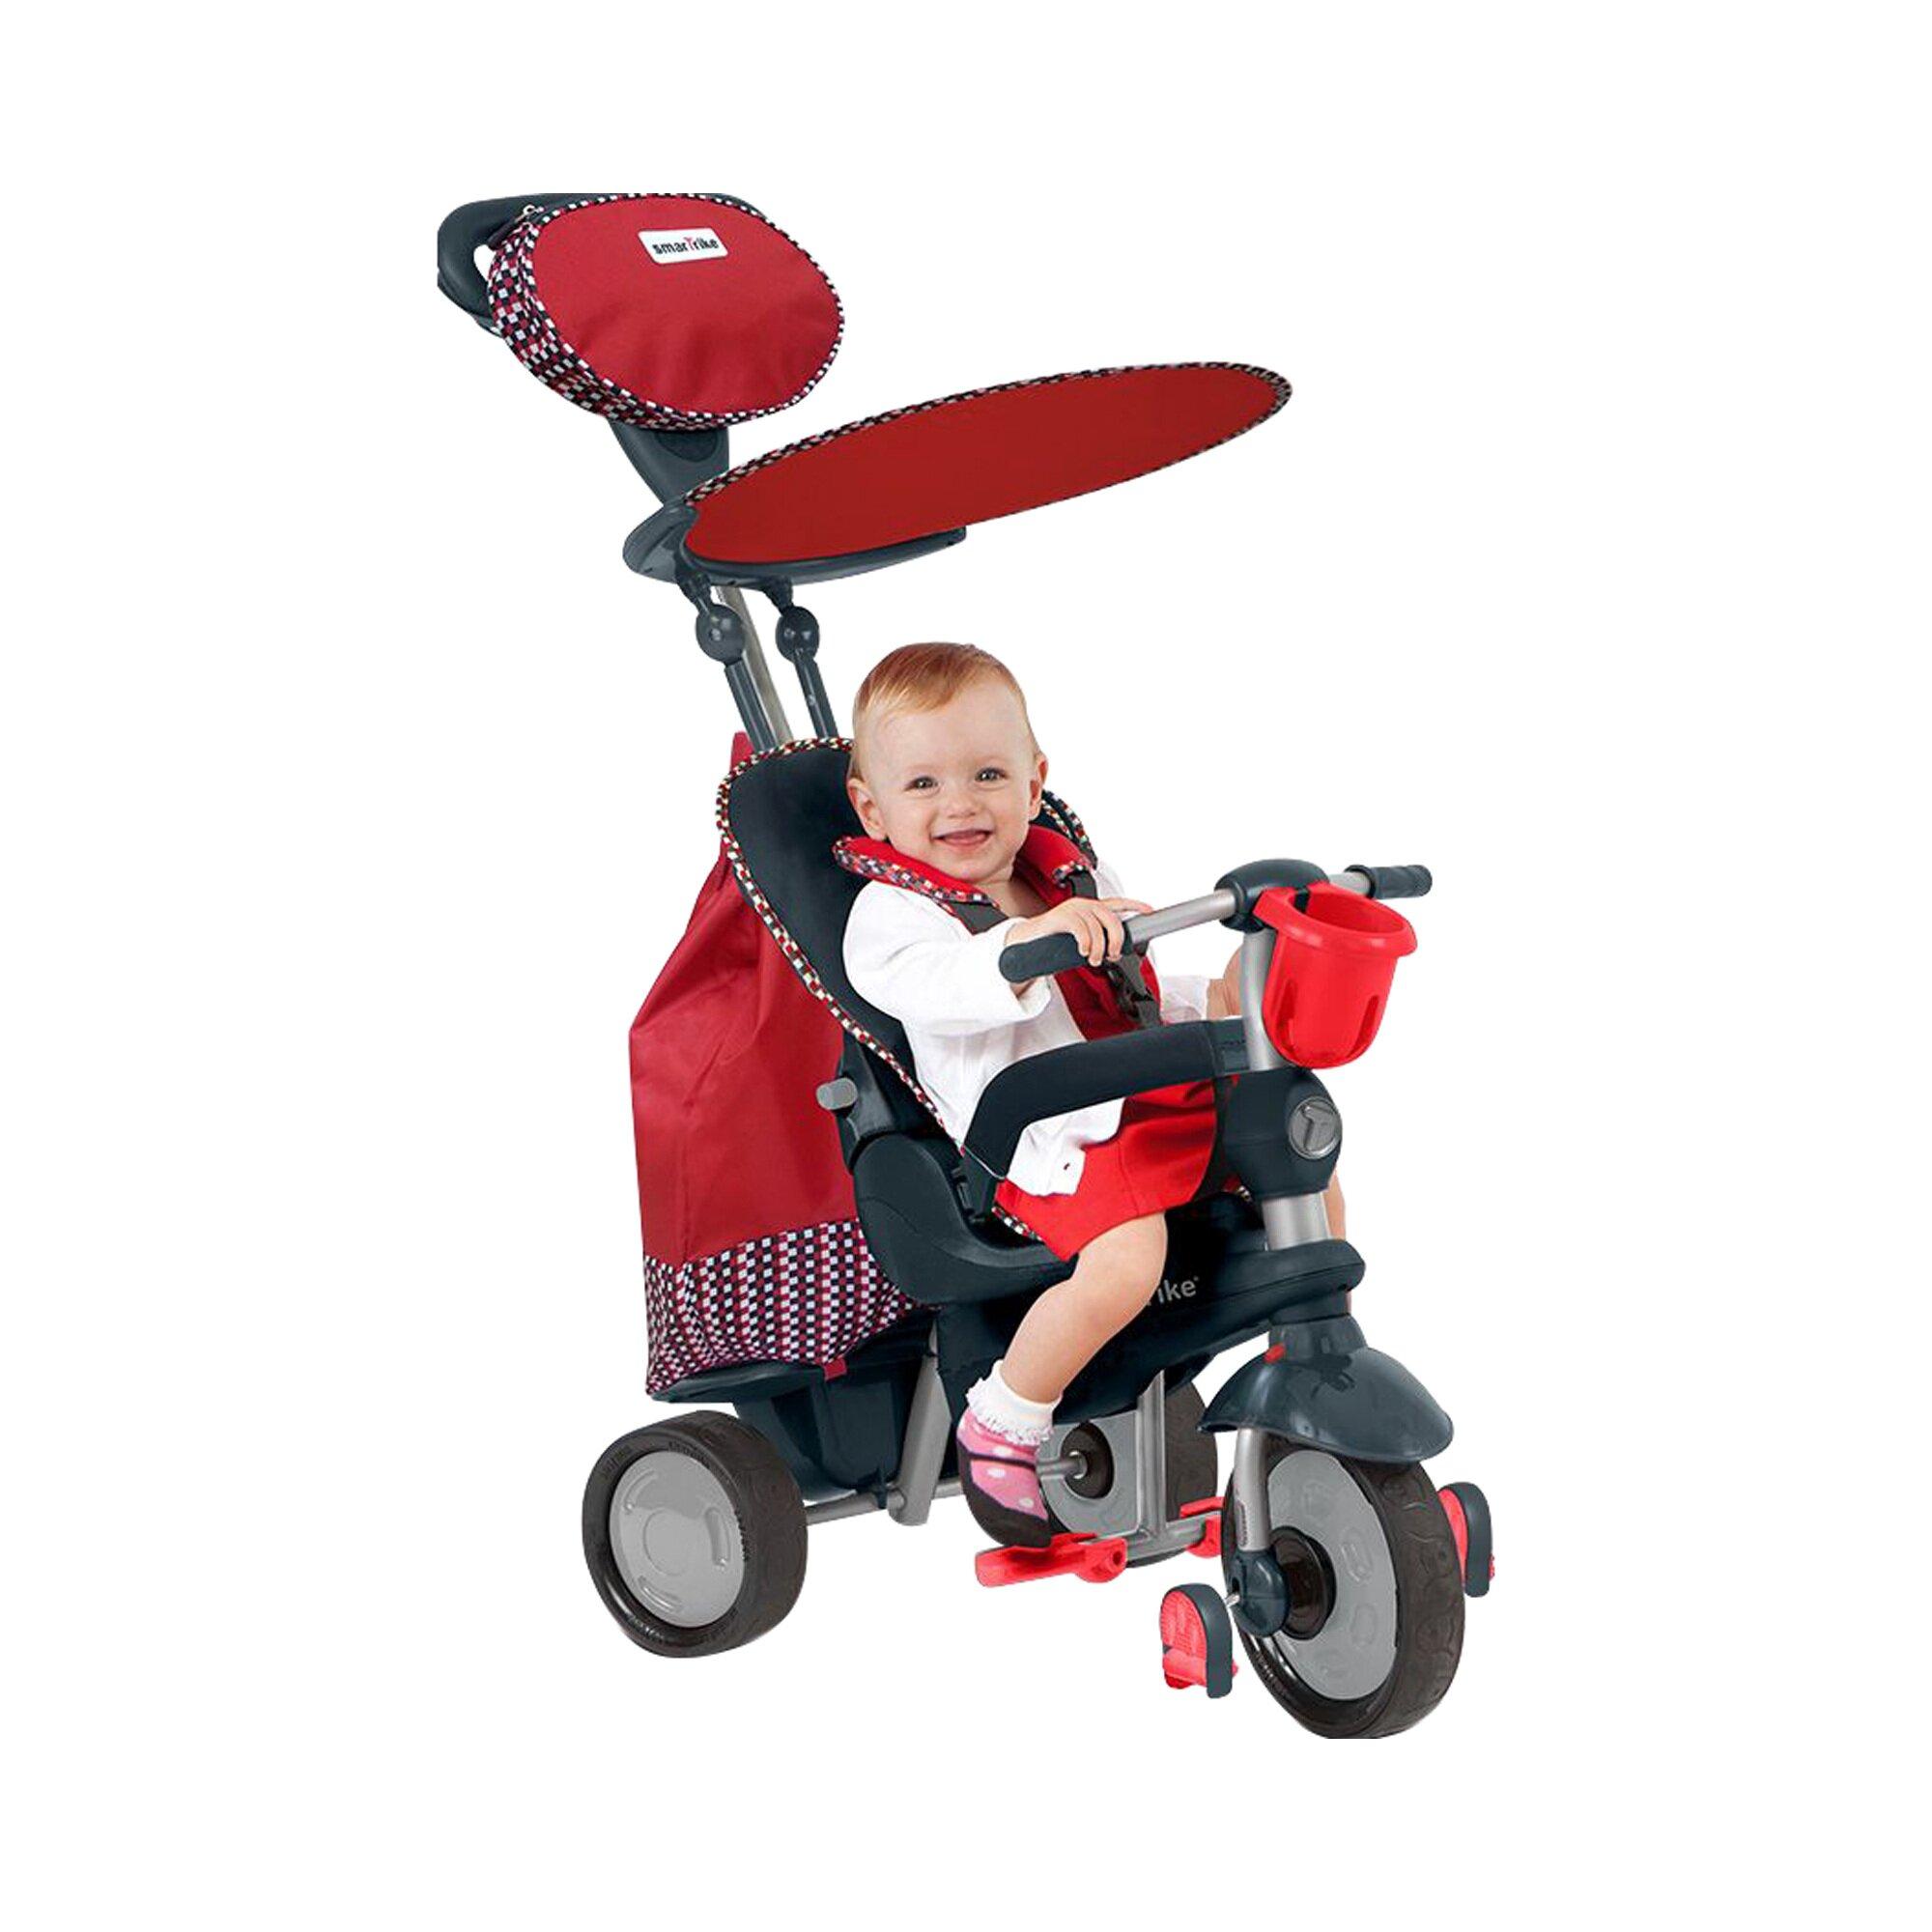 smartrike-dreirad-splash-5-in-1-baby-trike